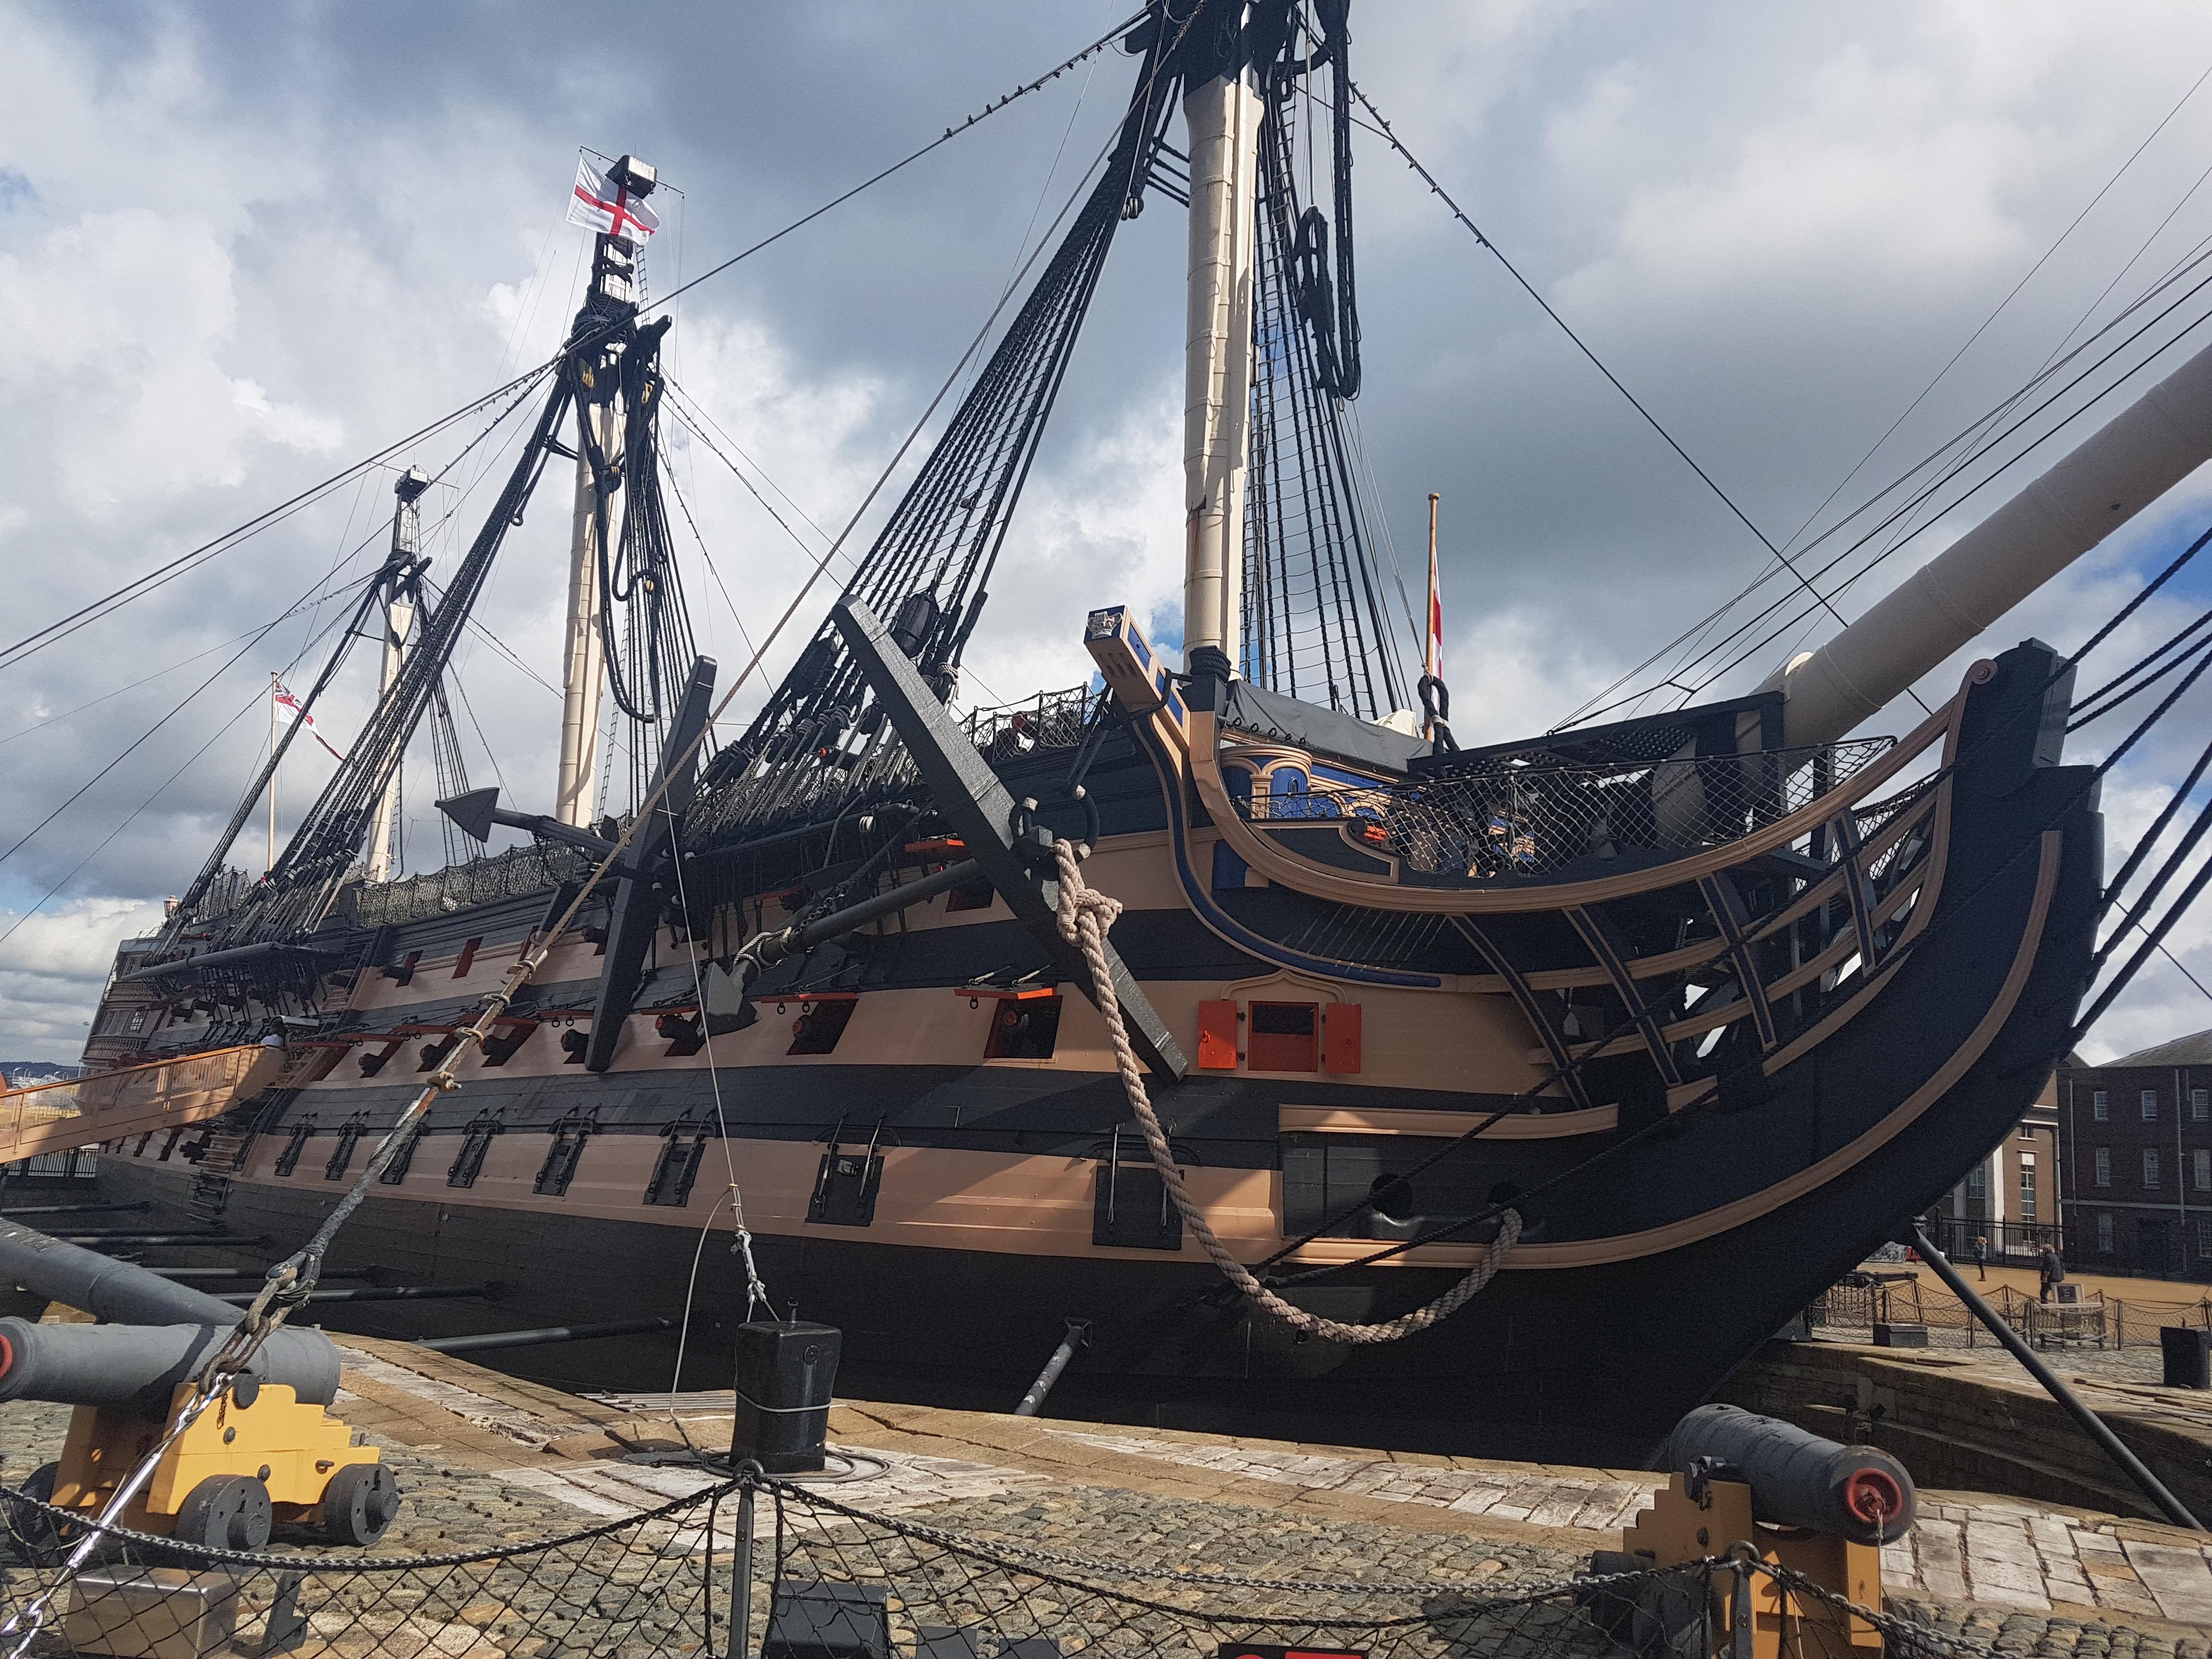 HMS Victory [10]